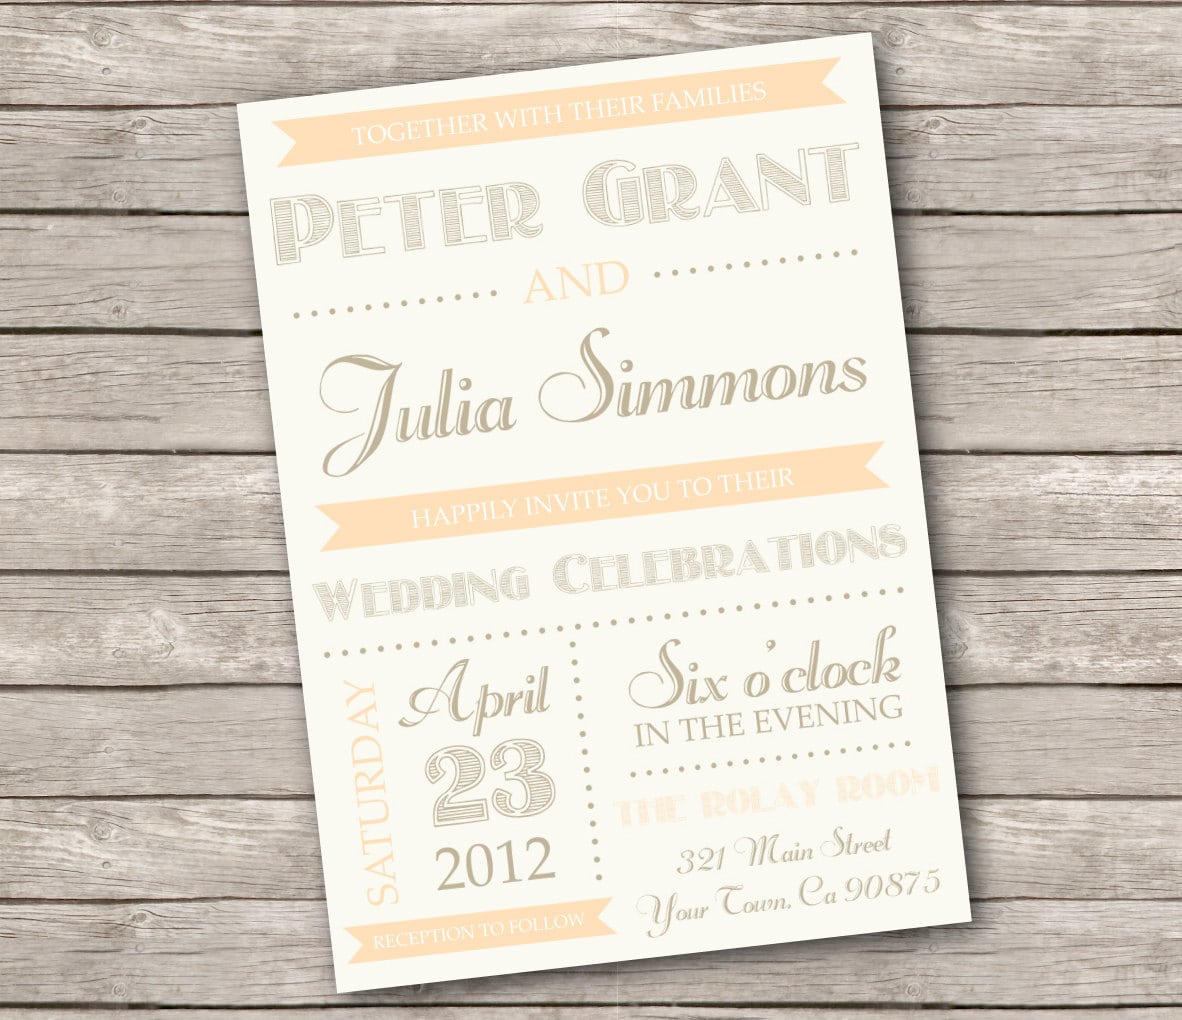 Rustic Country Wedding Invitation Templates